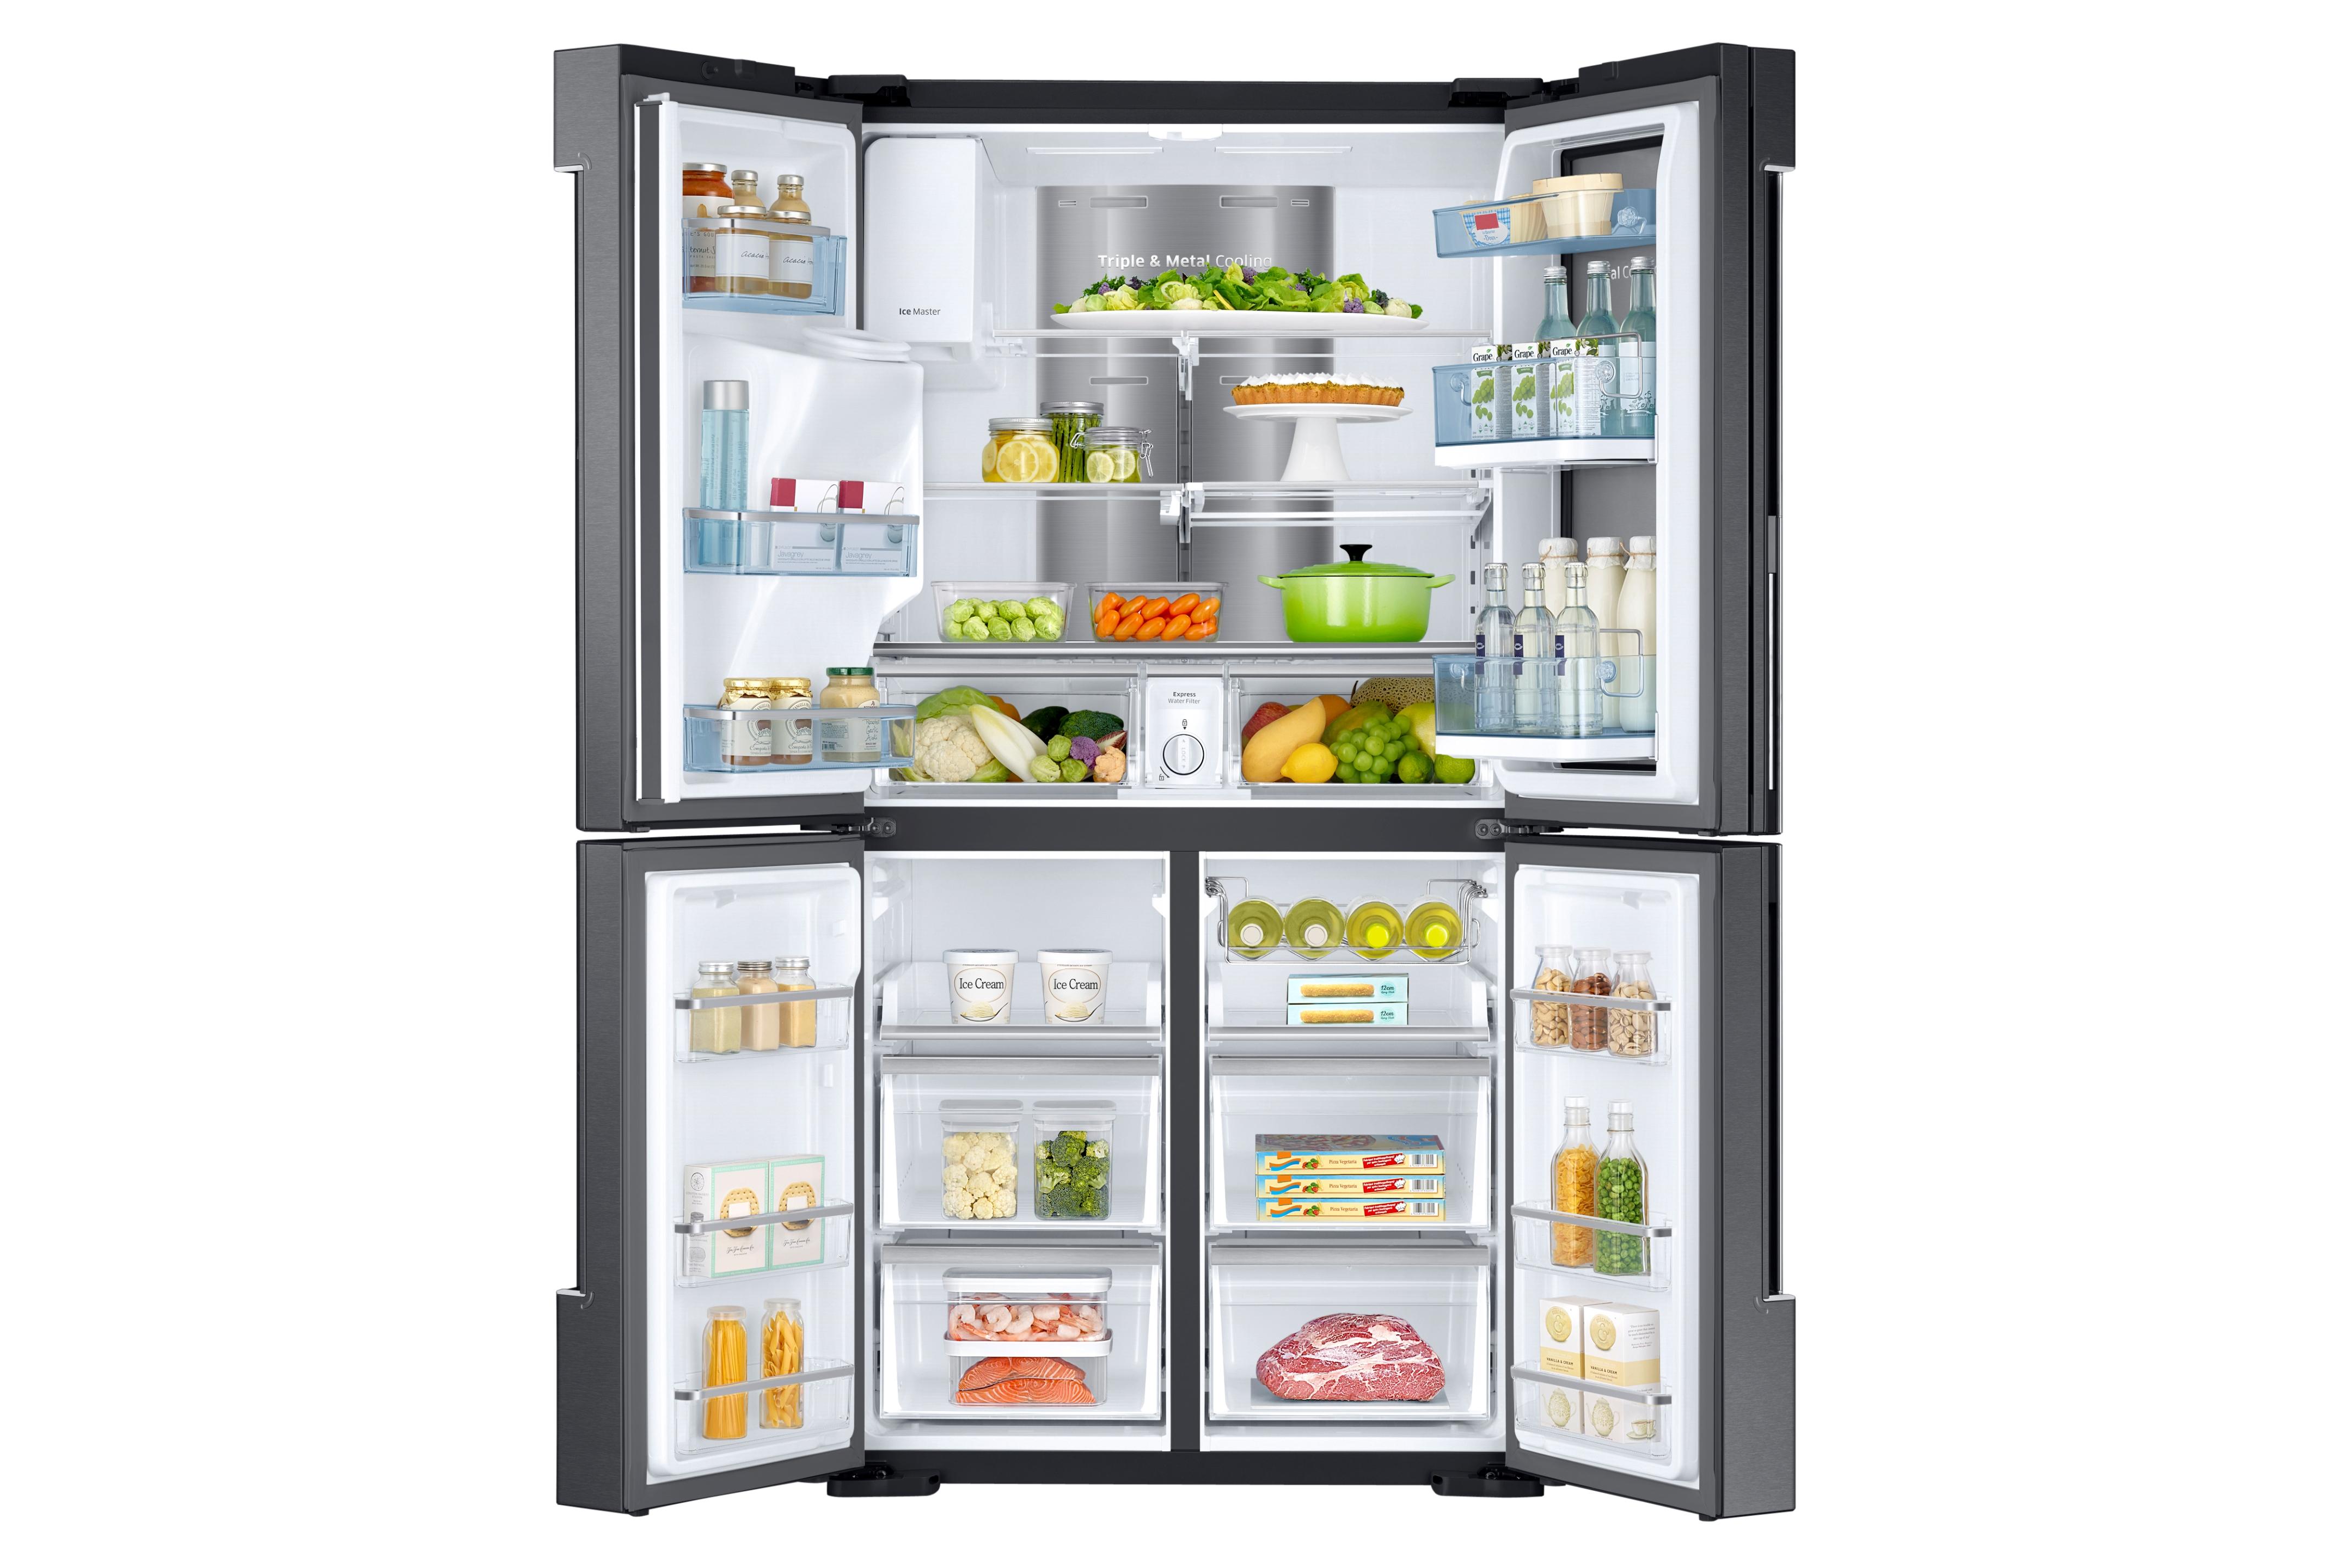 Samsung RF28K9380SG/AA 28 cu. ft. 4-Door Flex™ Food Showcase Refrigerator - Black Stainless Steel